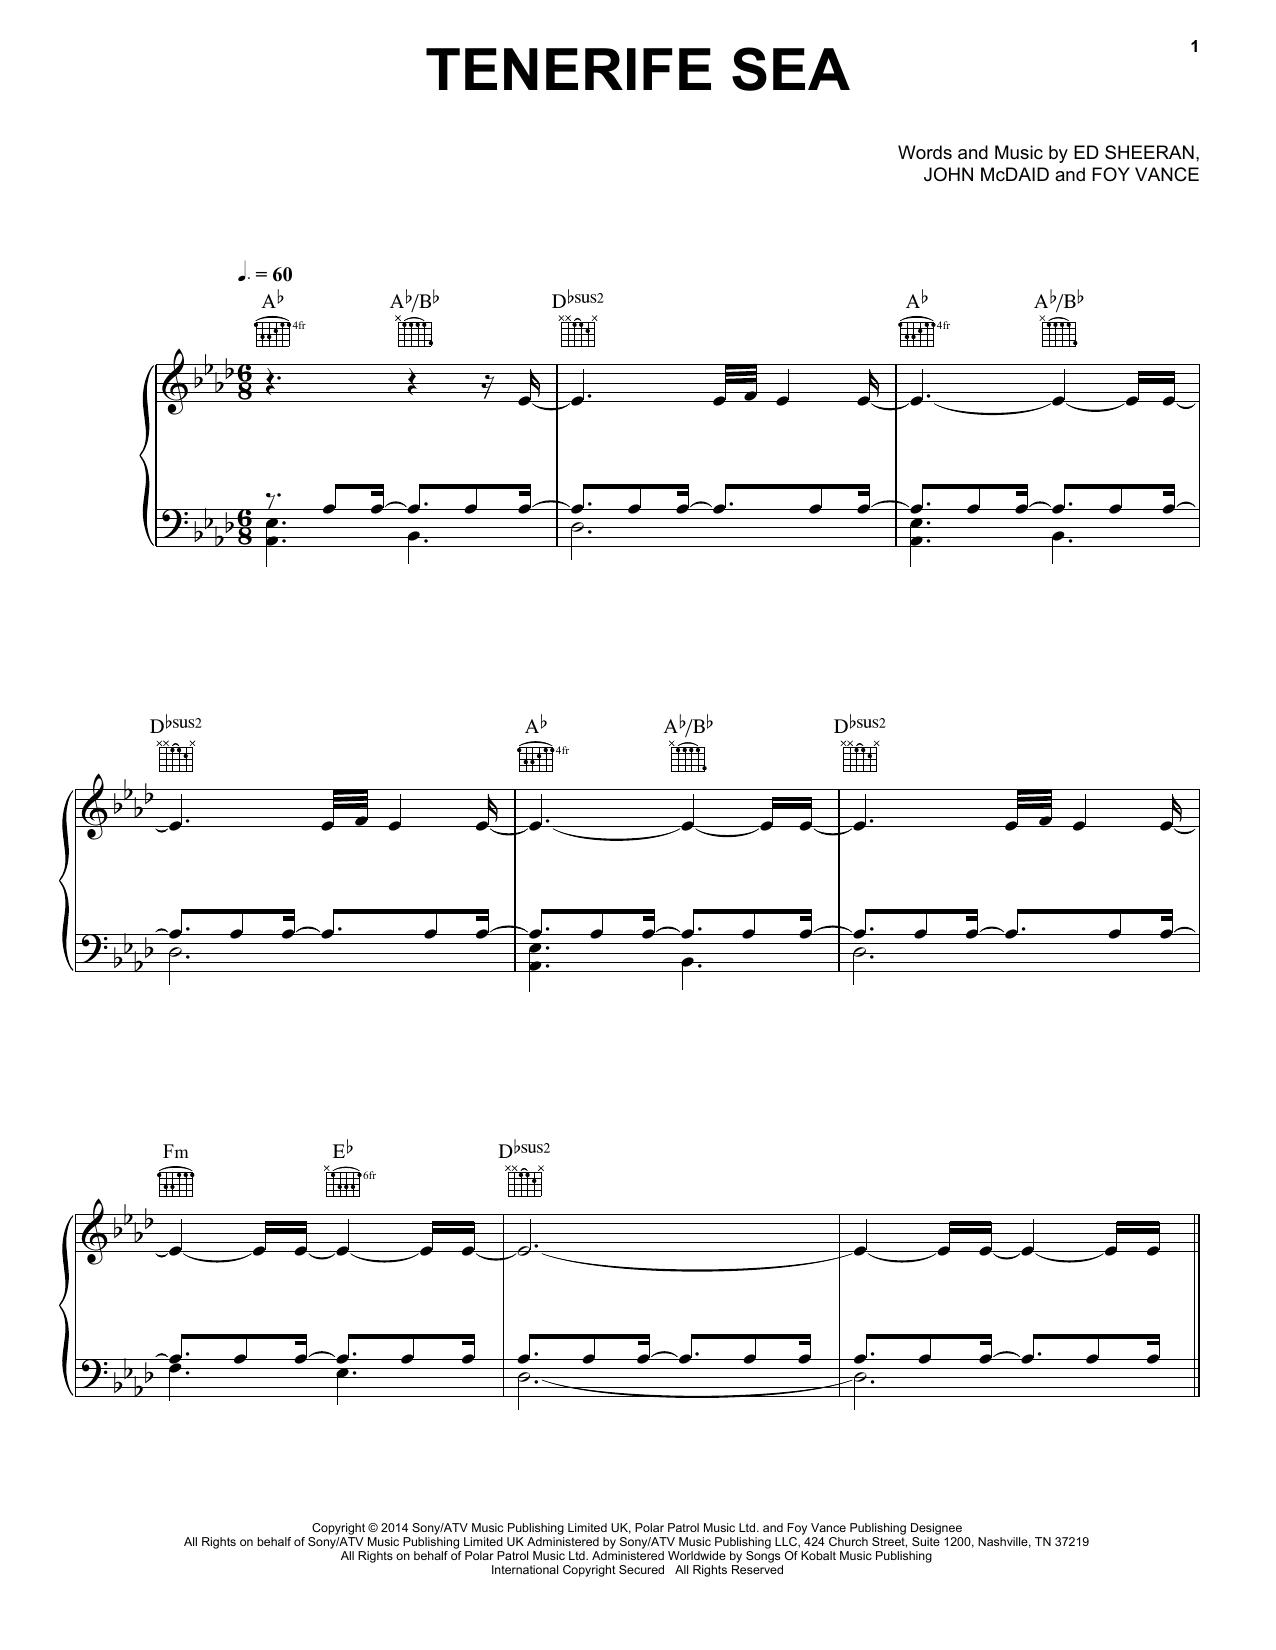 Ed Sheeran Tenerife Sea Sheet Music, Notes & Chords   Sheet music ...